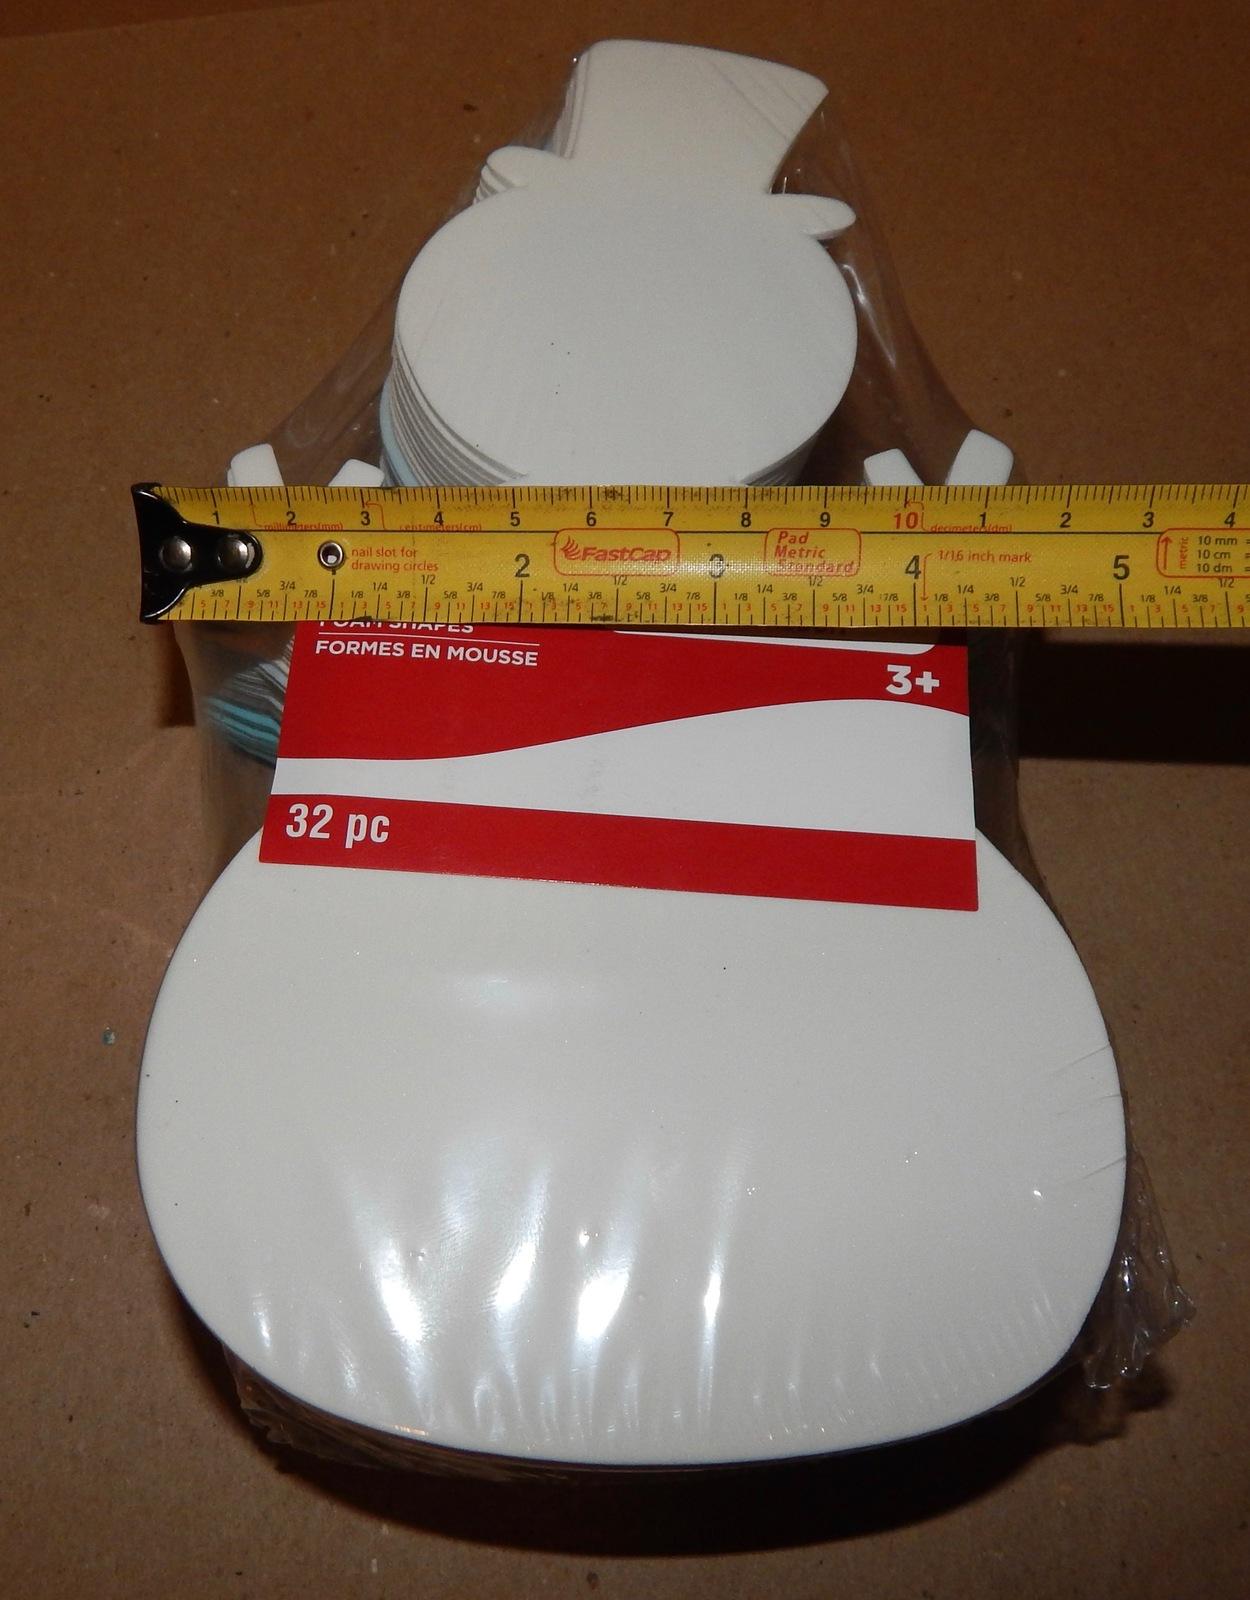 Christmas Foam Ornament Shapes 32pc Value Pack Crafts Snowman Creatology 148C